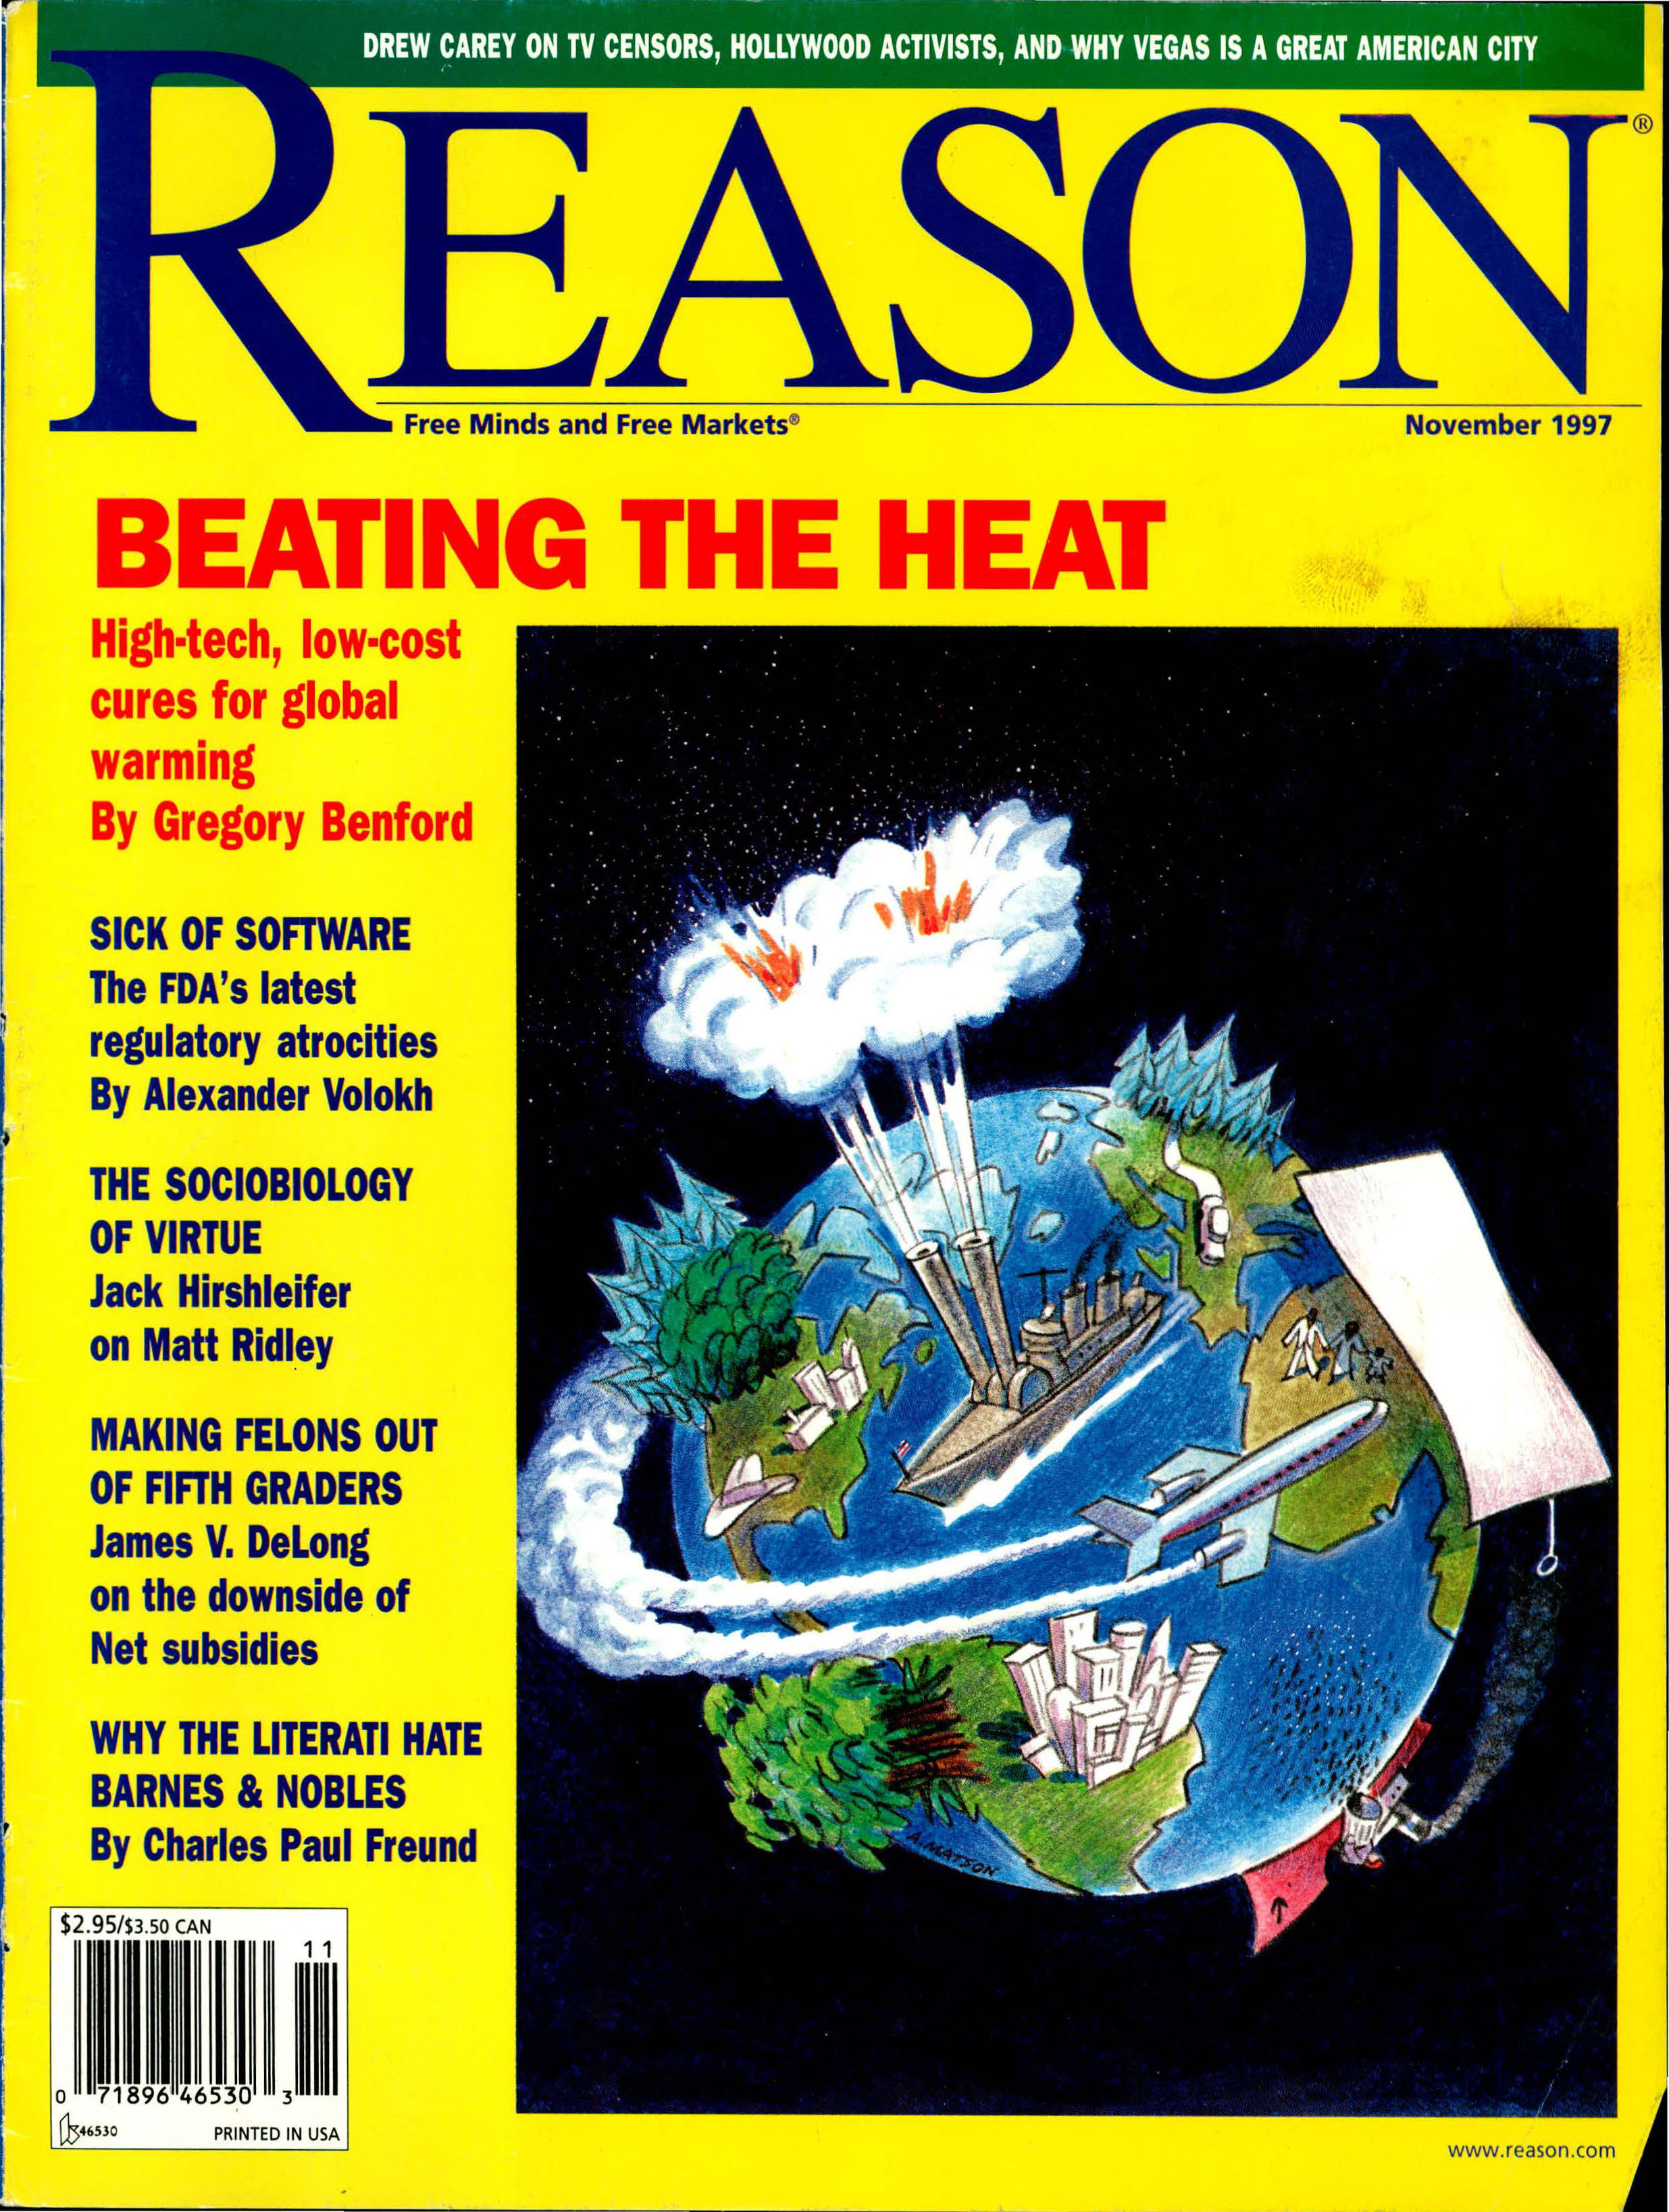 Reason Magazine, November 1997 cover image